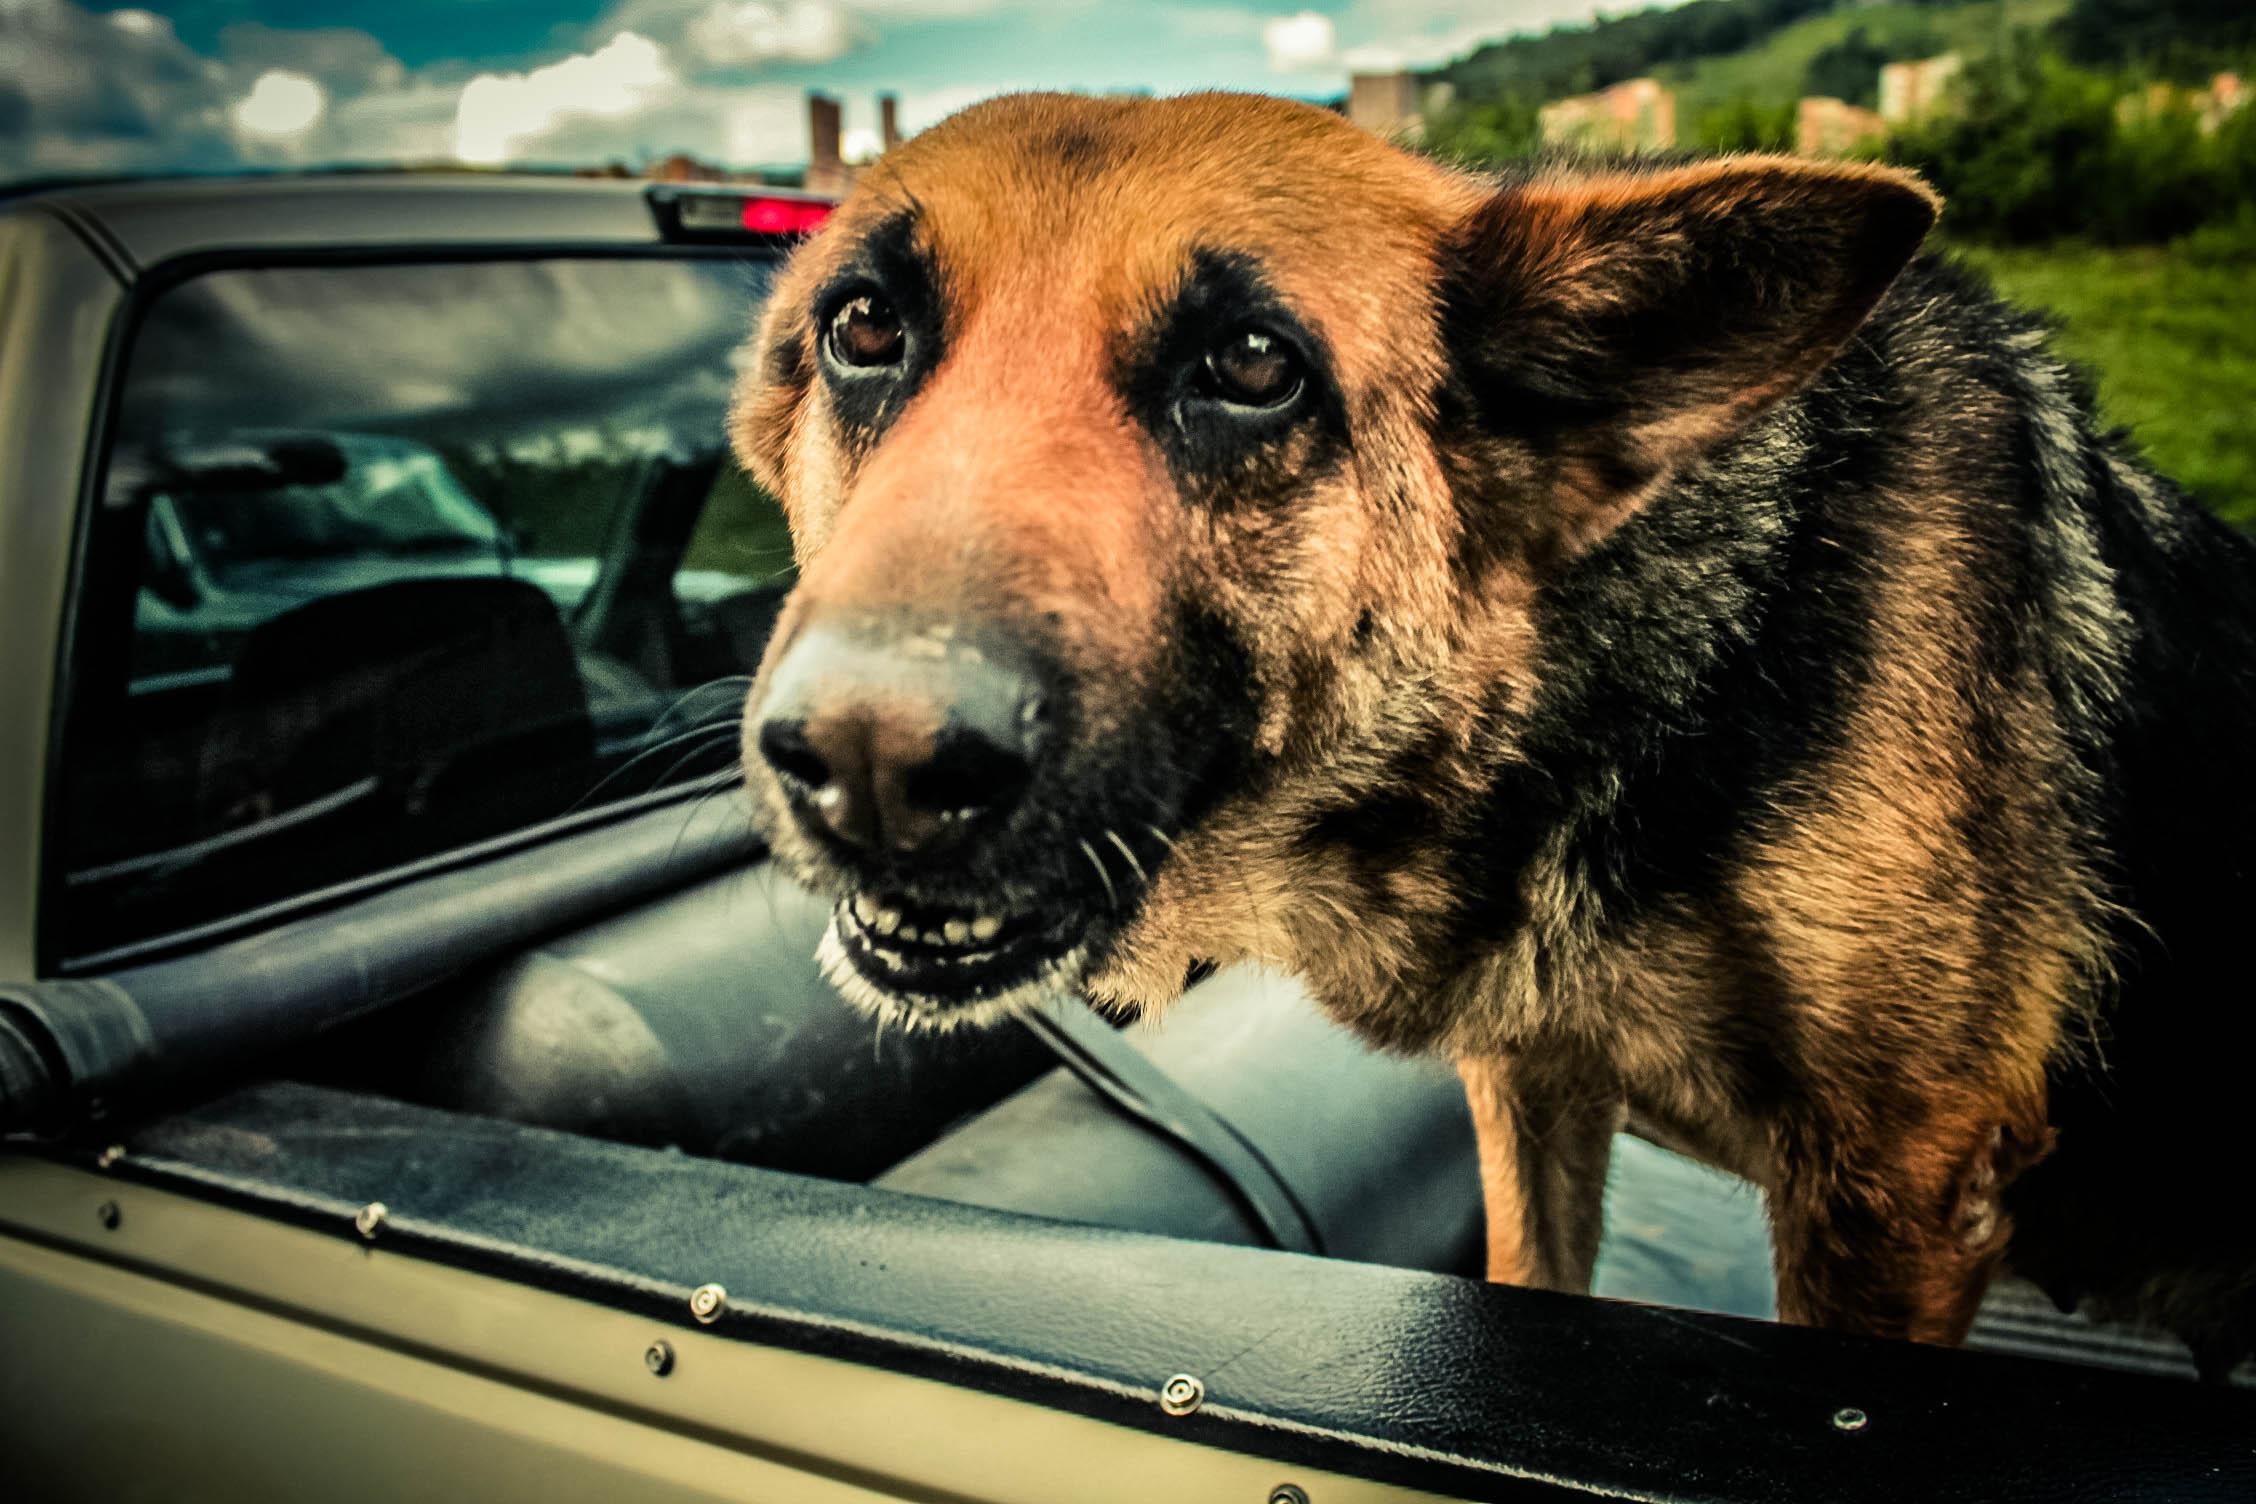 Dog, Animal, Car, HQ Photo